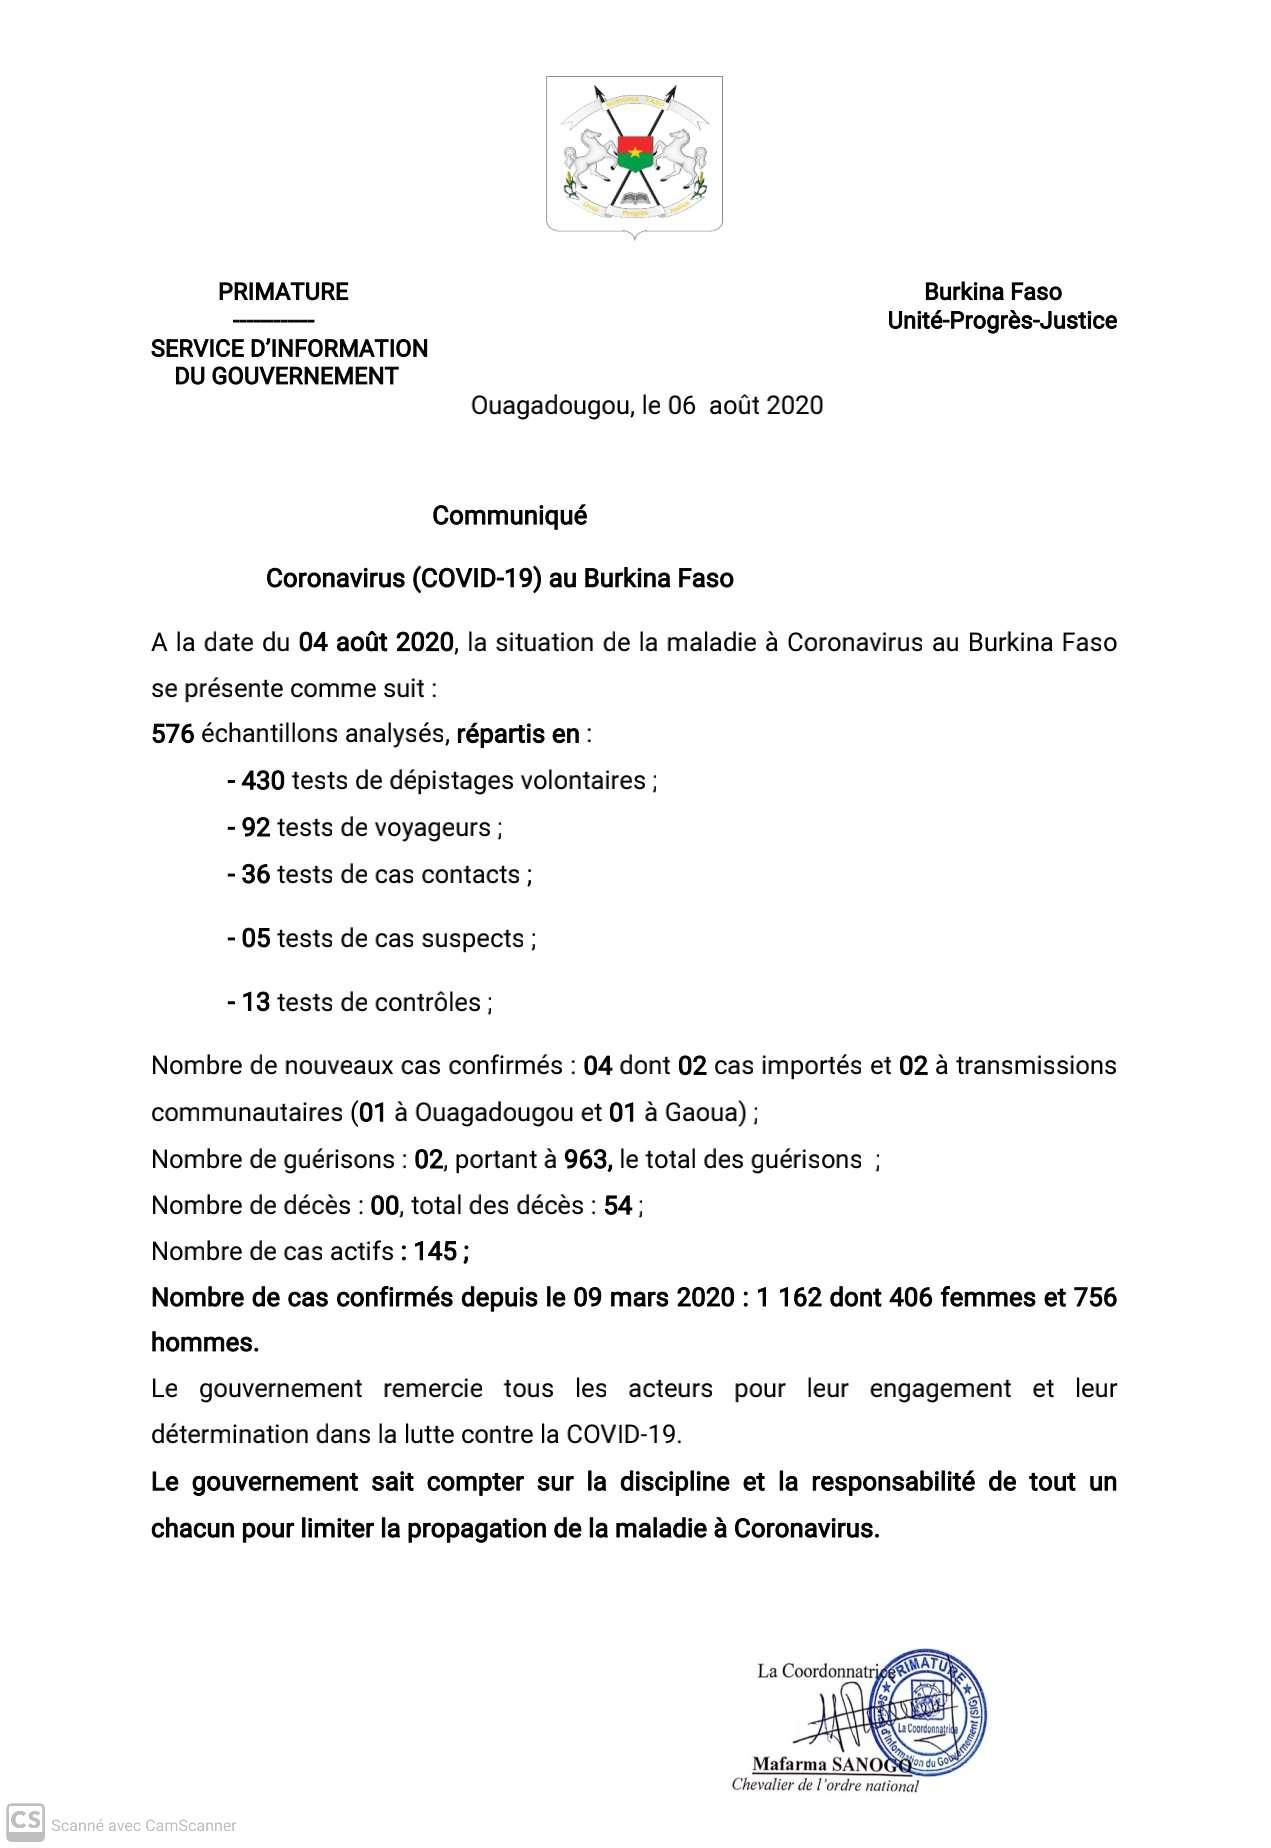 https://www.sig.gov.bf/fileadmin/user_upload/Communique___point__Covid-19_Burkina_Faso_04_aout_2020.jpg